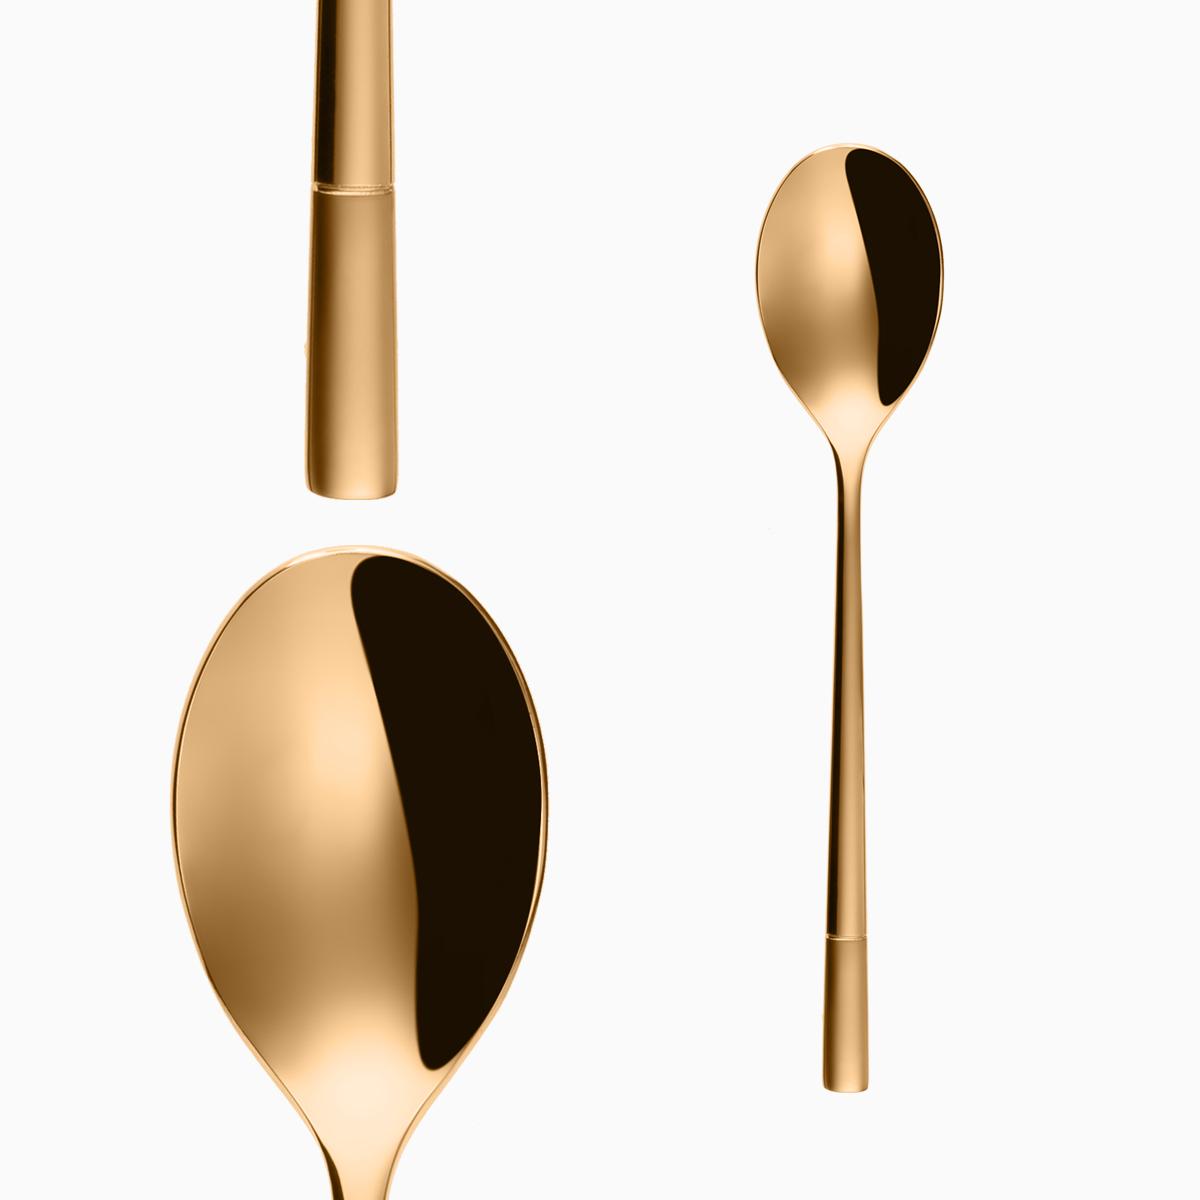 luxus-gold-sandblast-part3